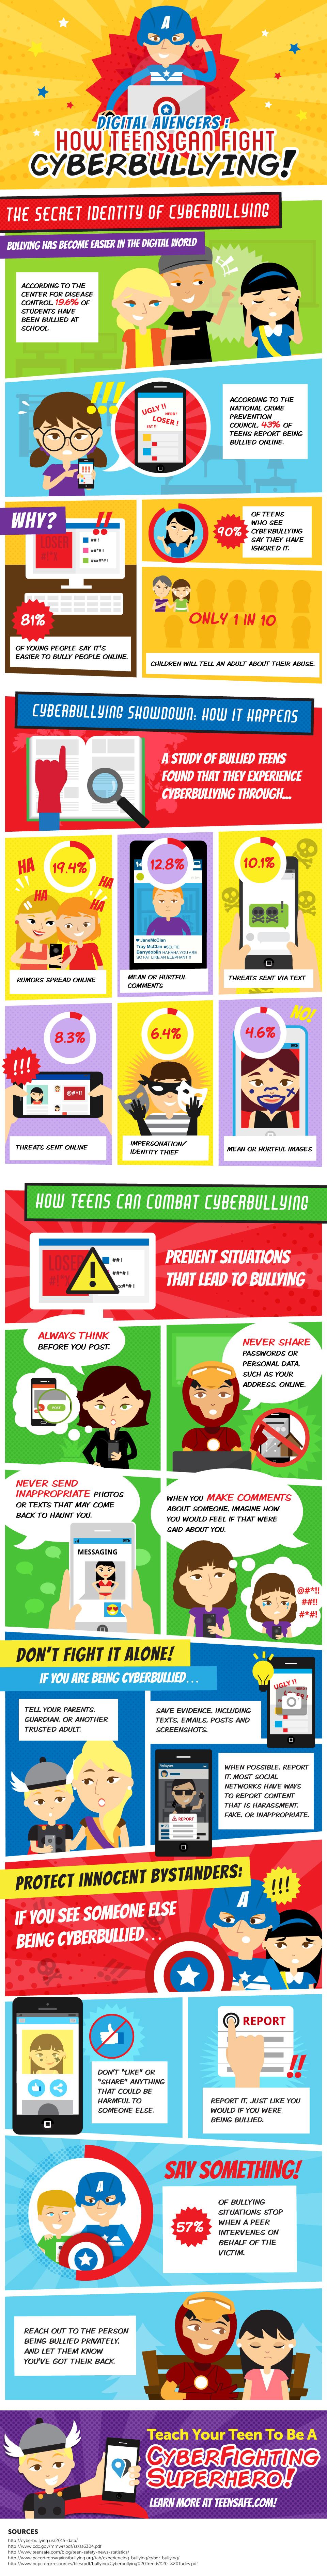 DigitalAvengersTeensFightCyberbullying